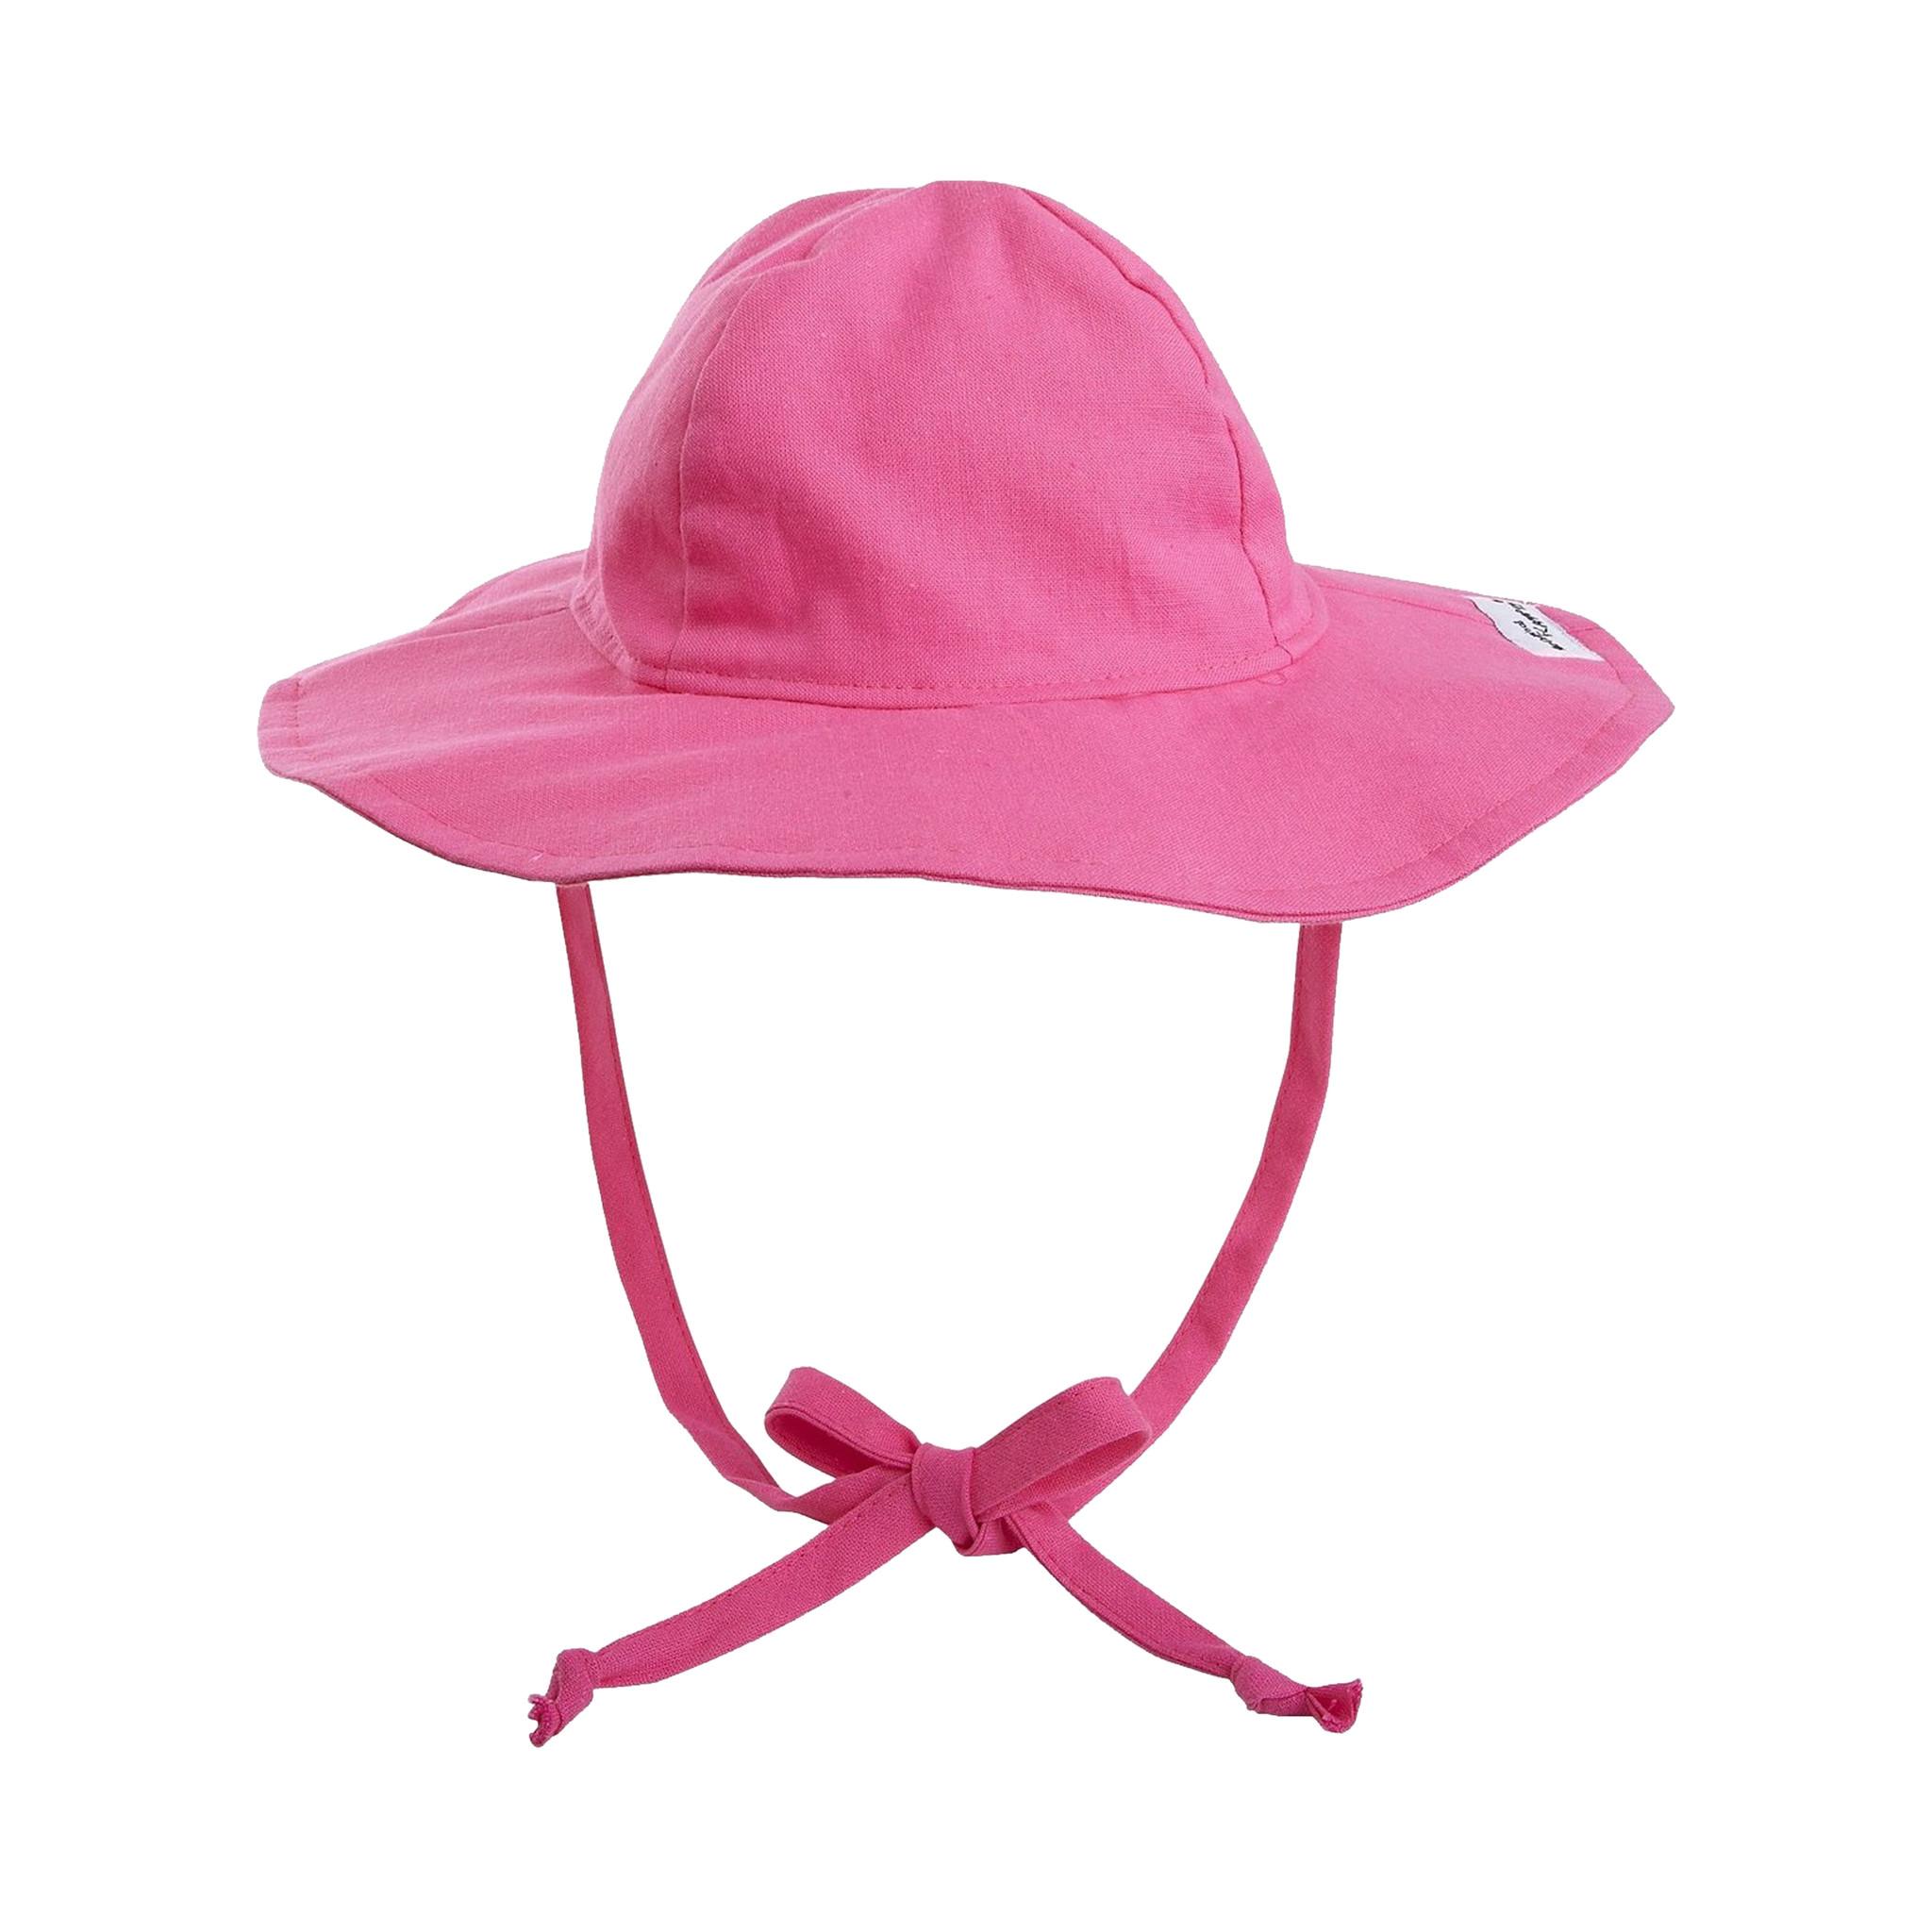 Flap Happy Hot Pink Floppy Hat